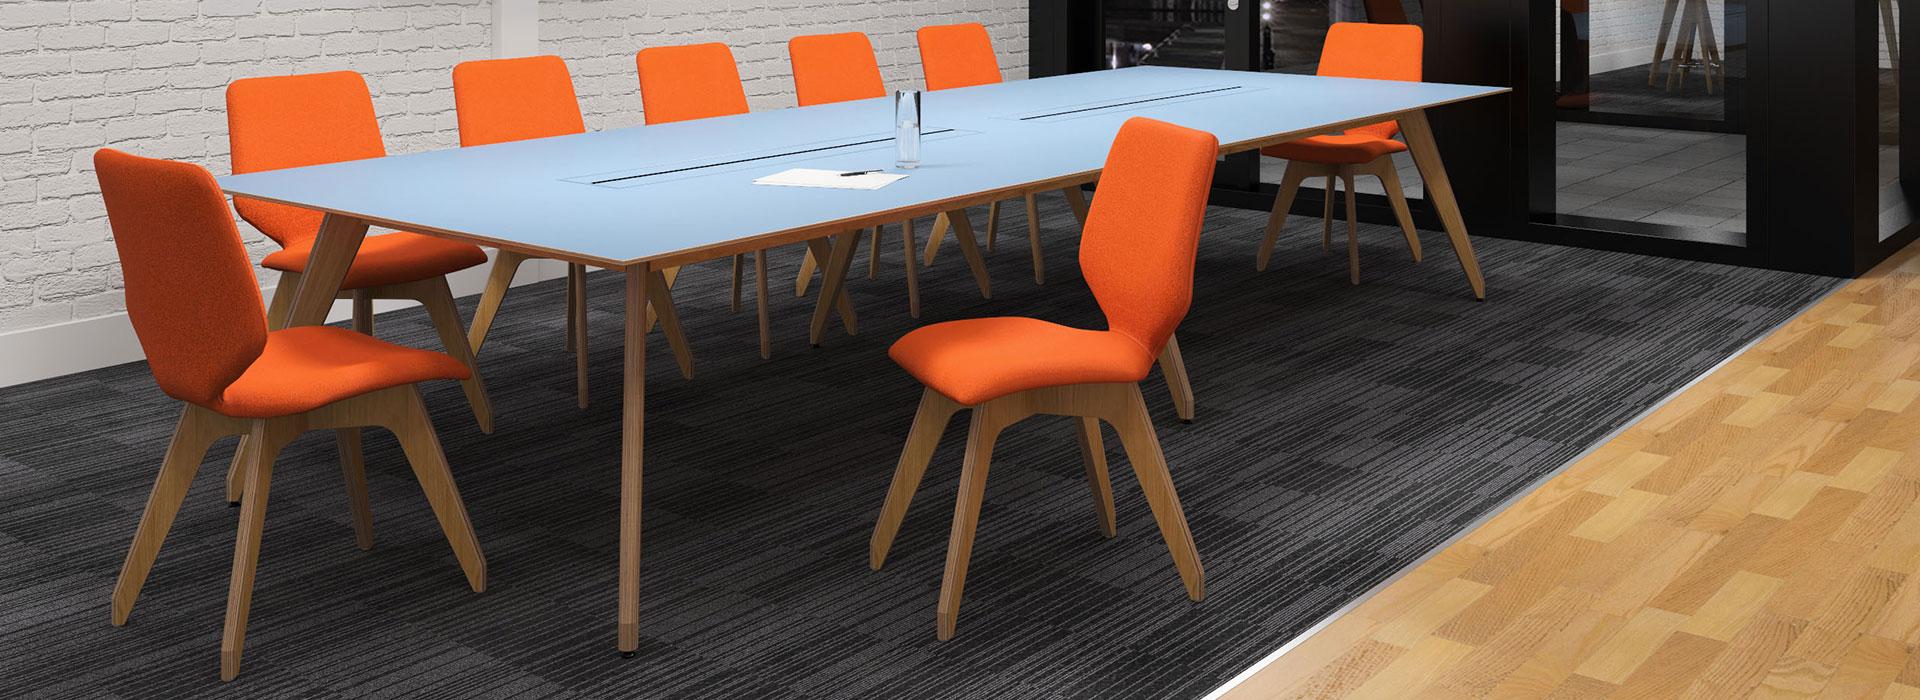 Severn Furnishing | Office Furniture Cheltenham | Gloucester | Bristol